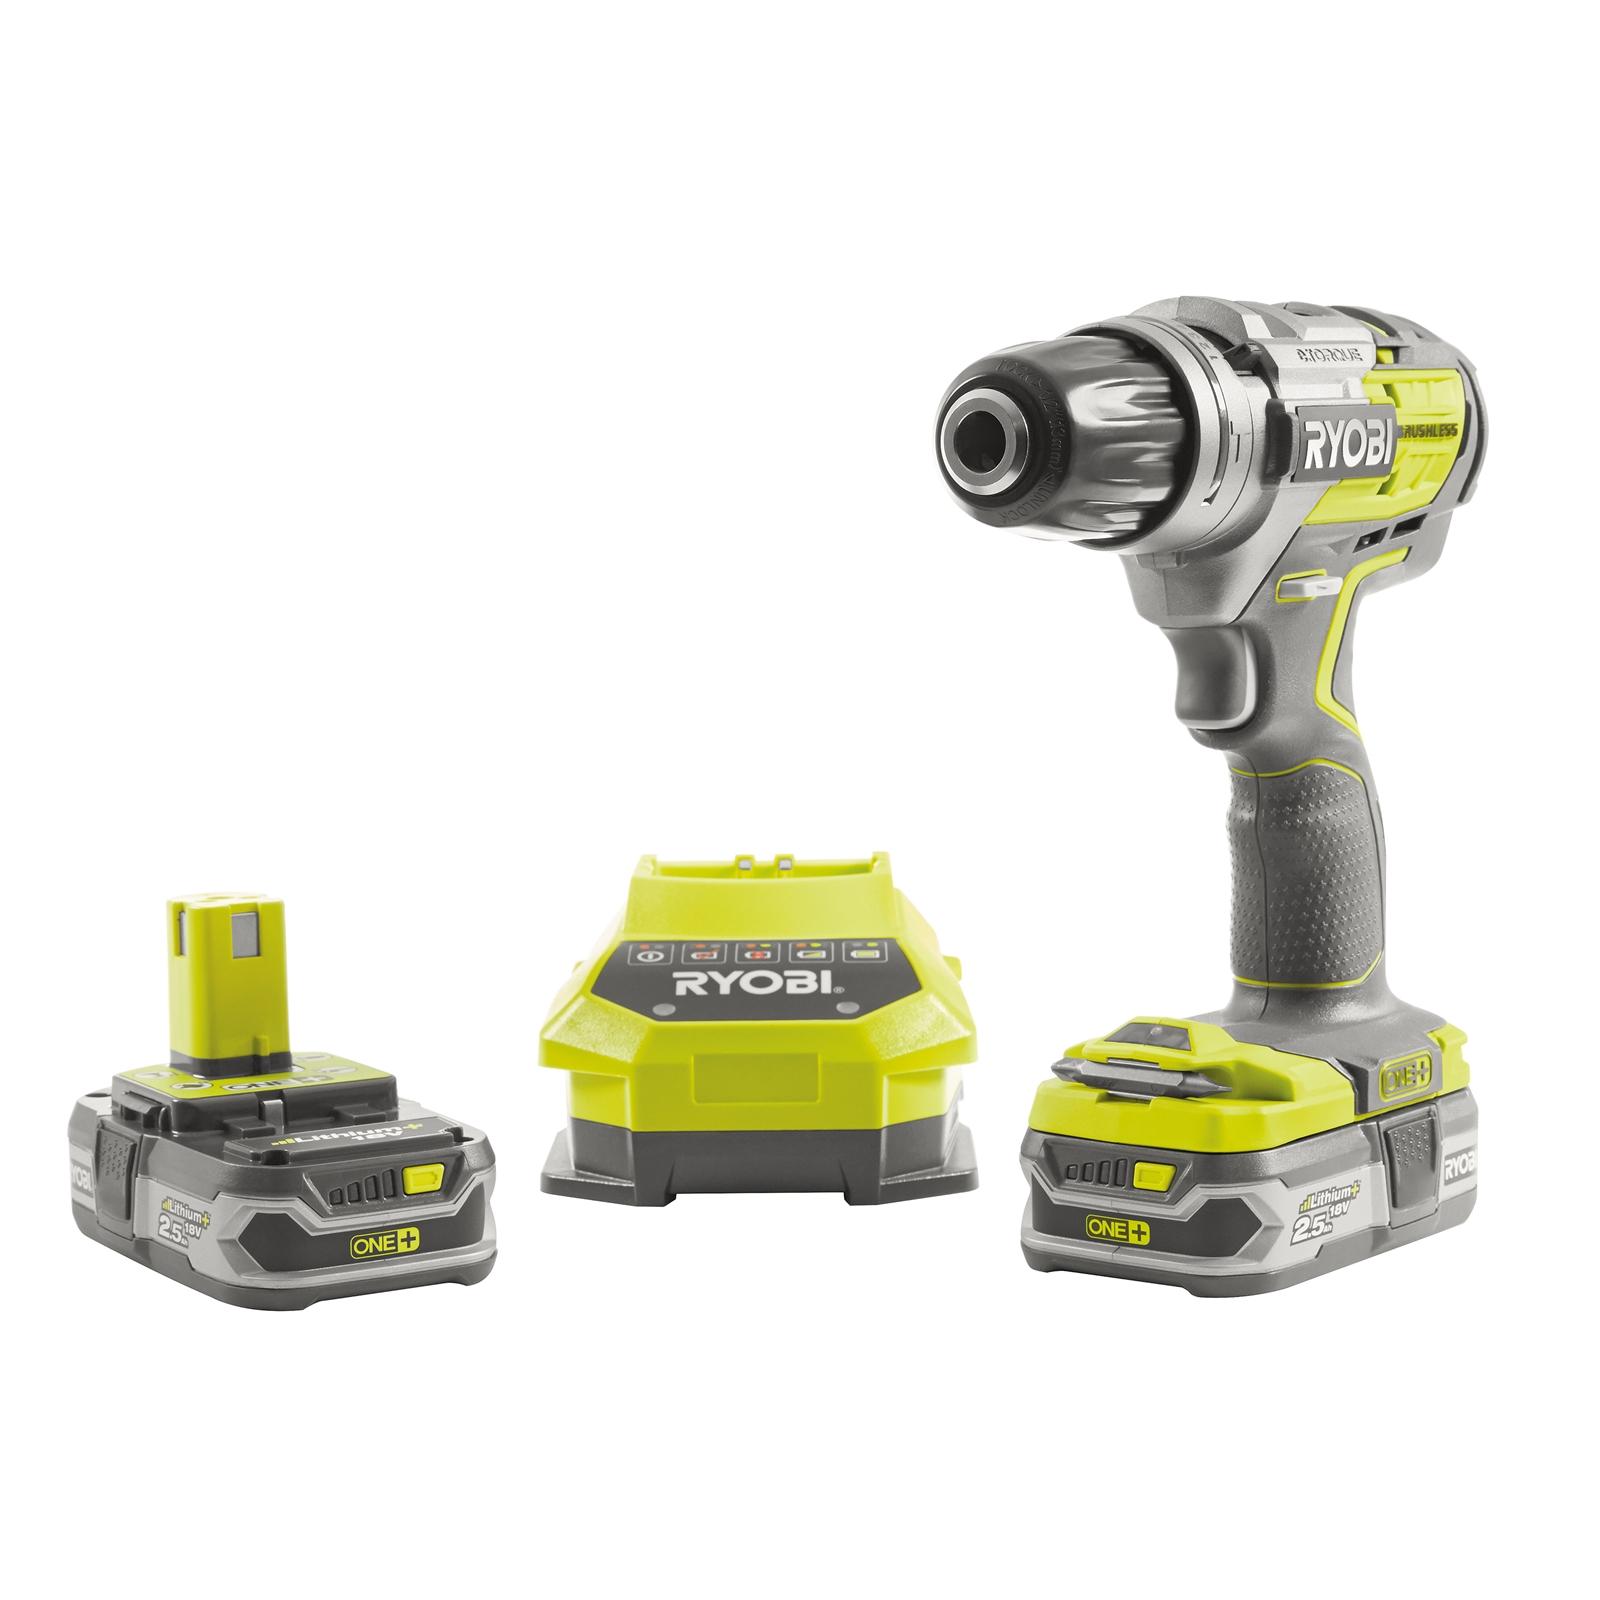 Ryobi Drill and 2 batteries - £71.40 @ Homebase